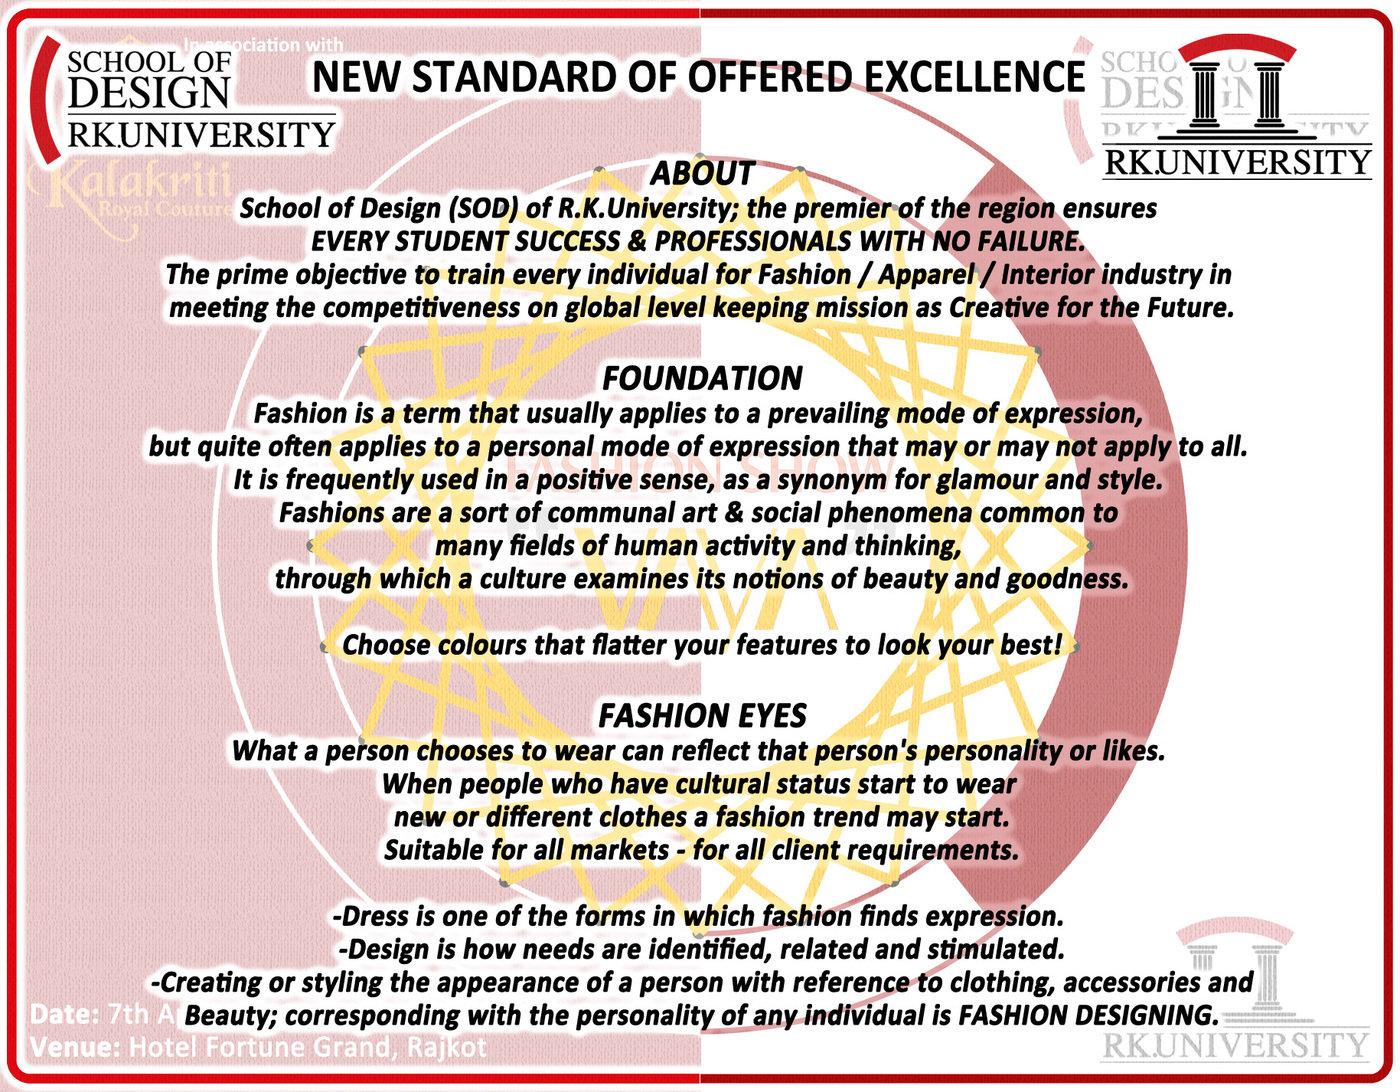 Vaya Fashion Show School Of Design R K University By Vishal Anand At Coroflot Com